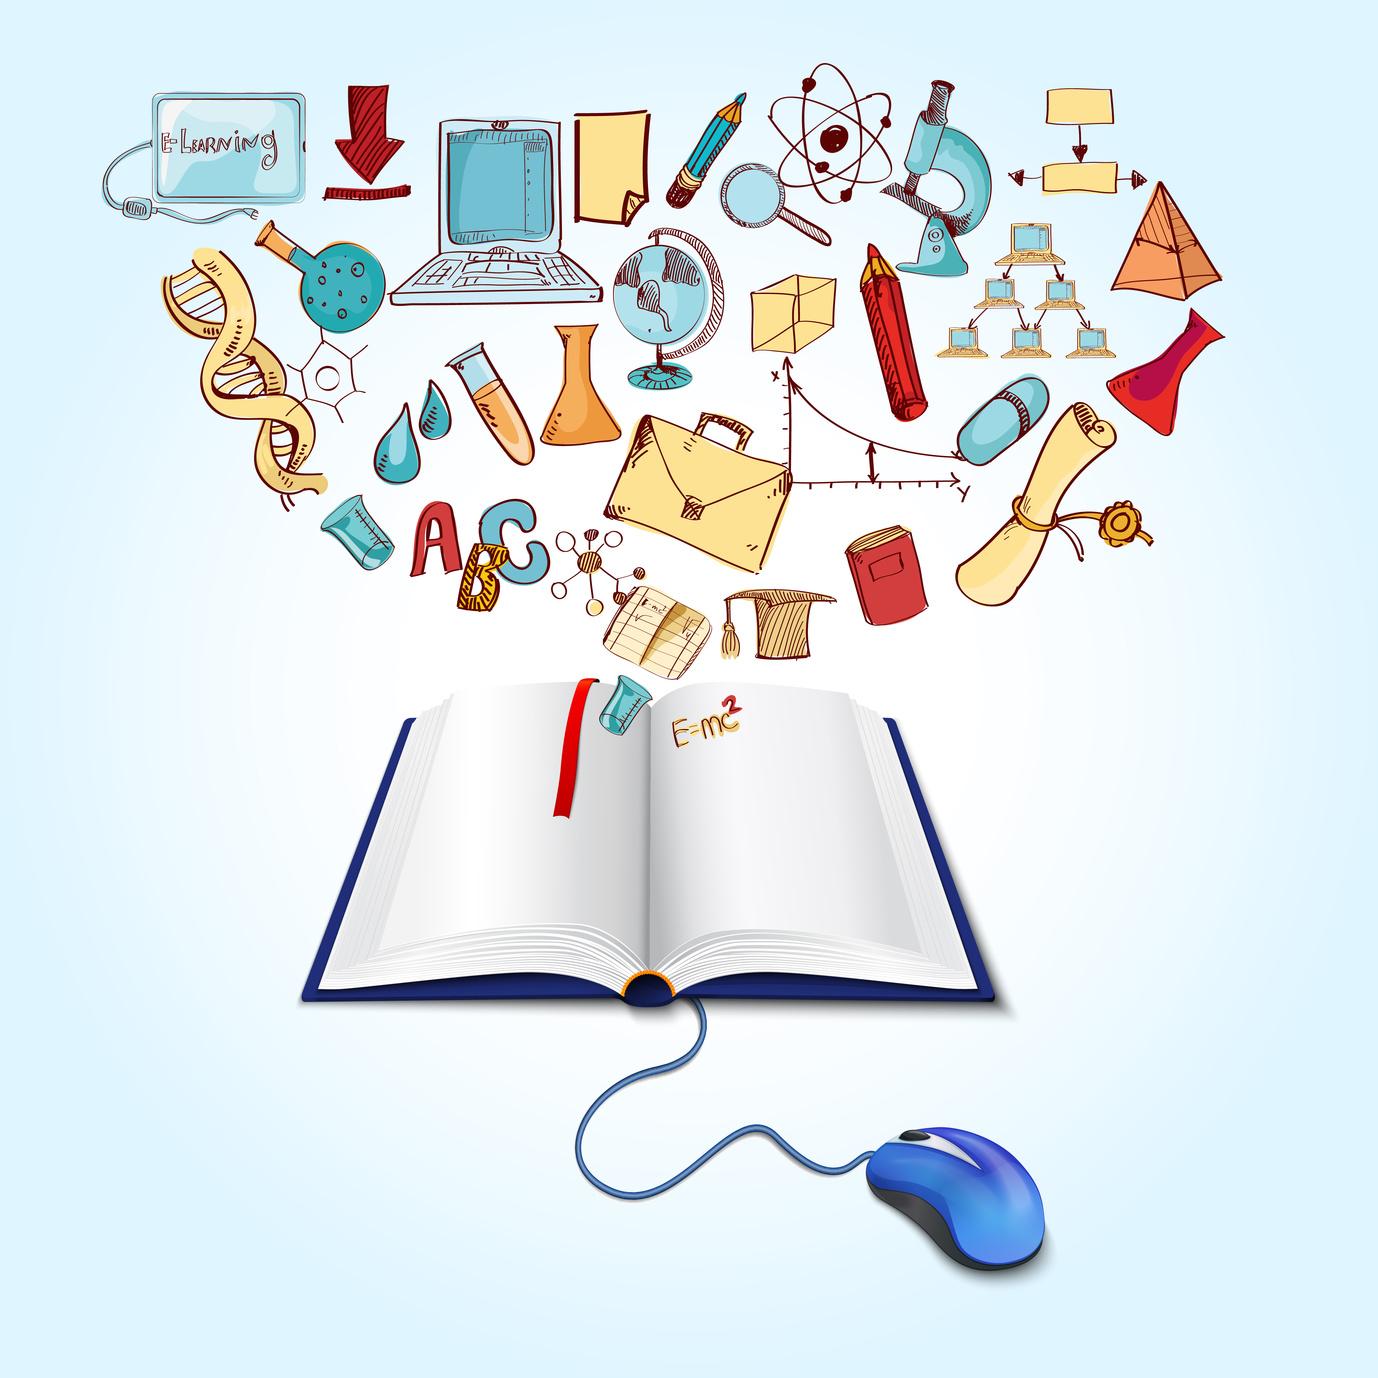 microsoft azure in education industry